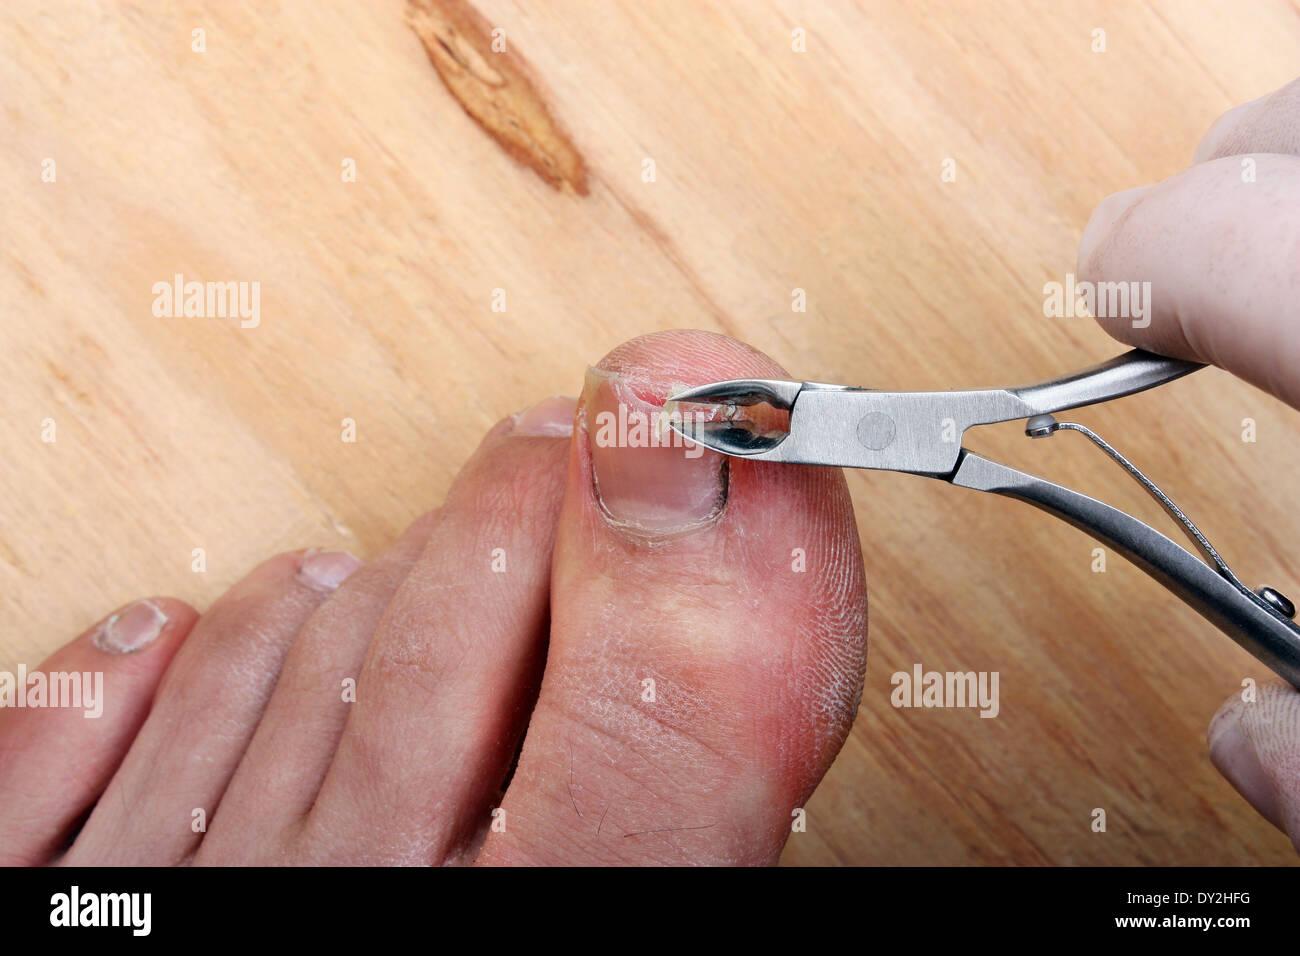 Surgery on a broken toe nail a man Stock Photo: 68284484 - Alamy